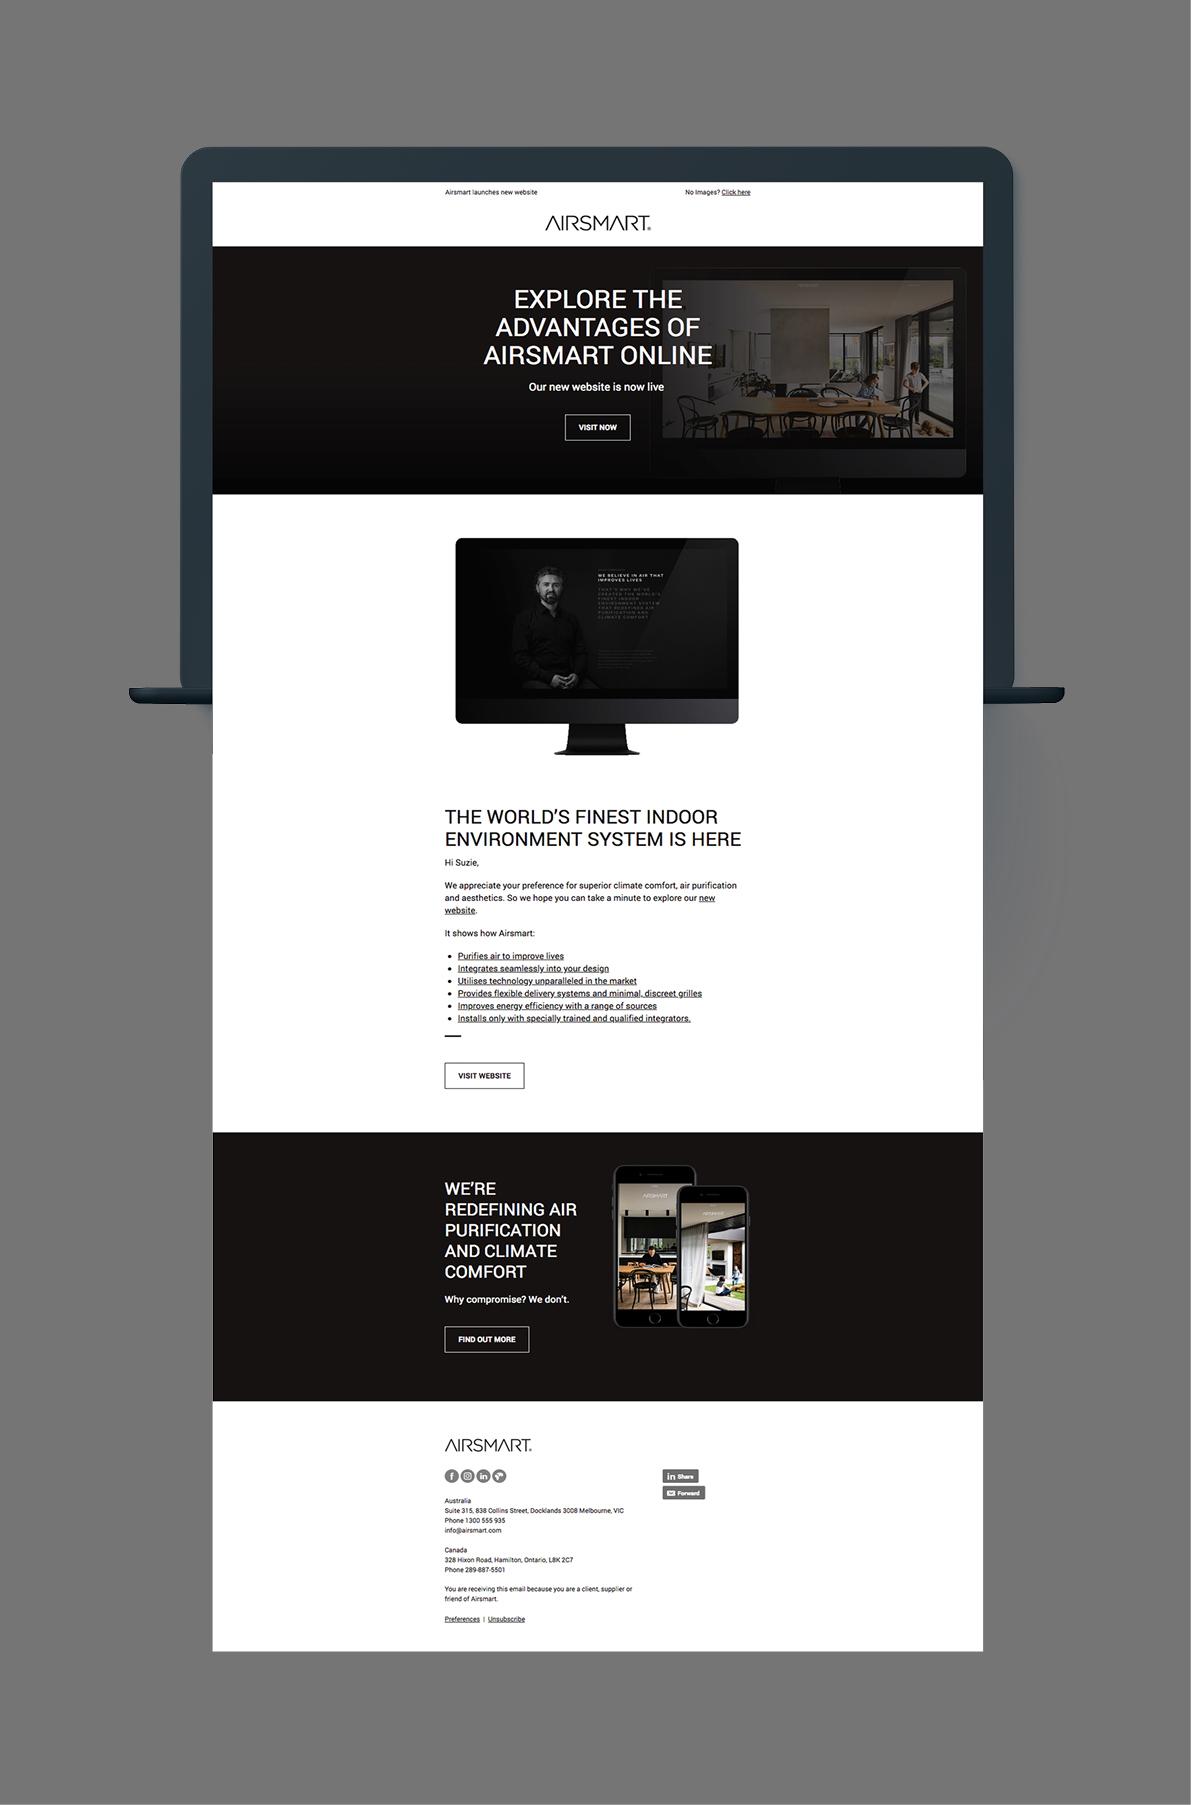 tout-creative-airsmart-email-marketing.jpg